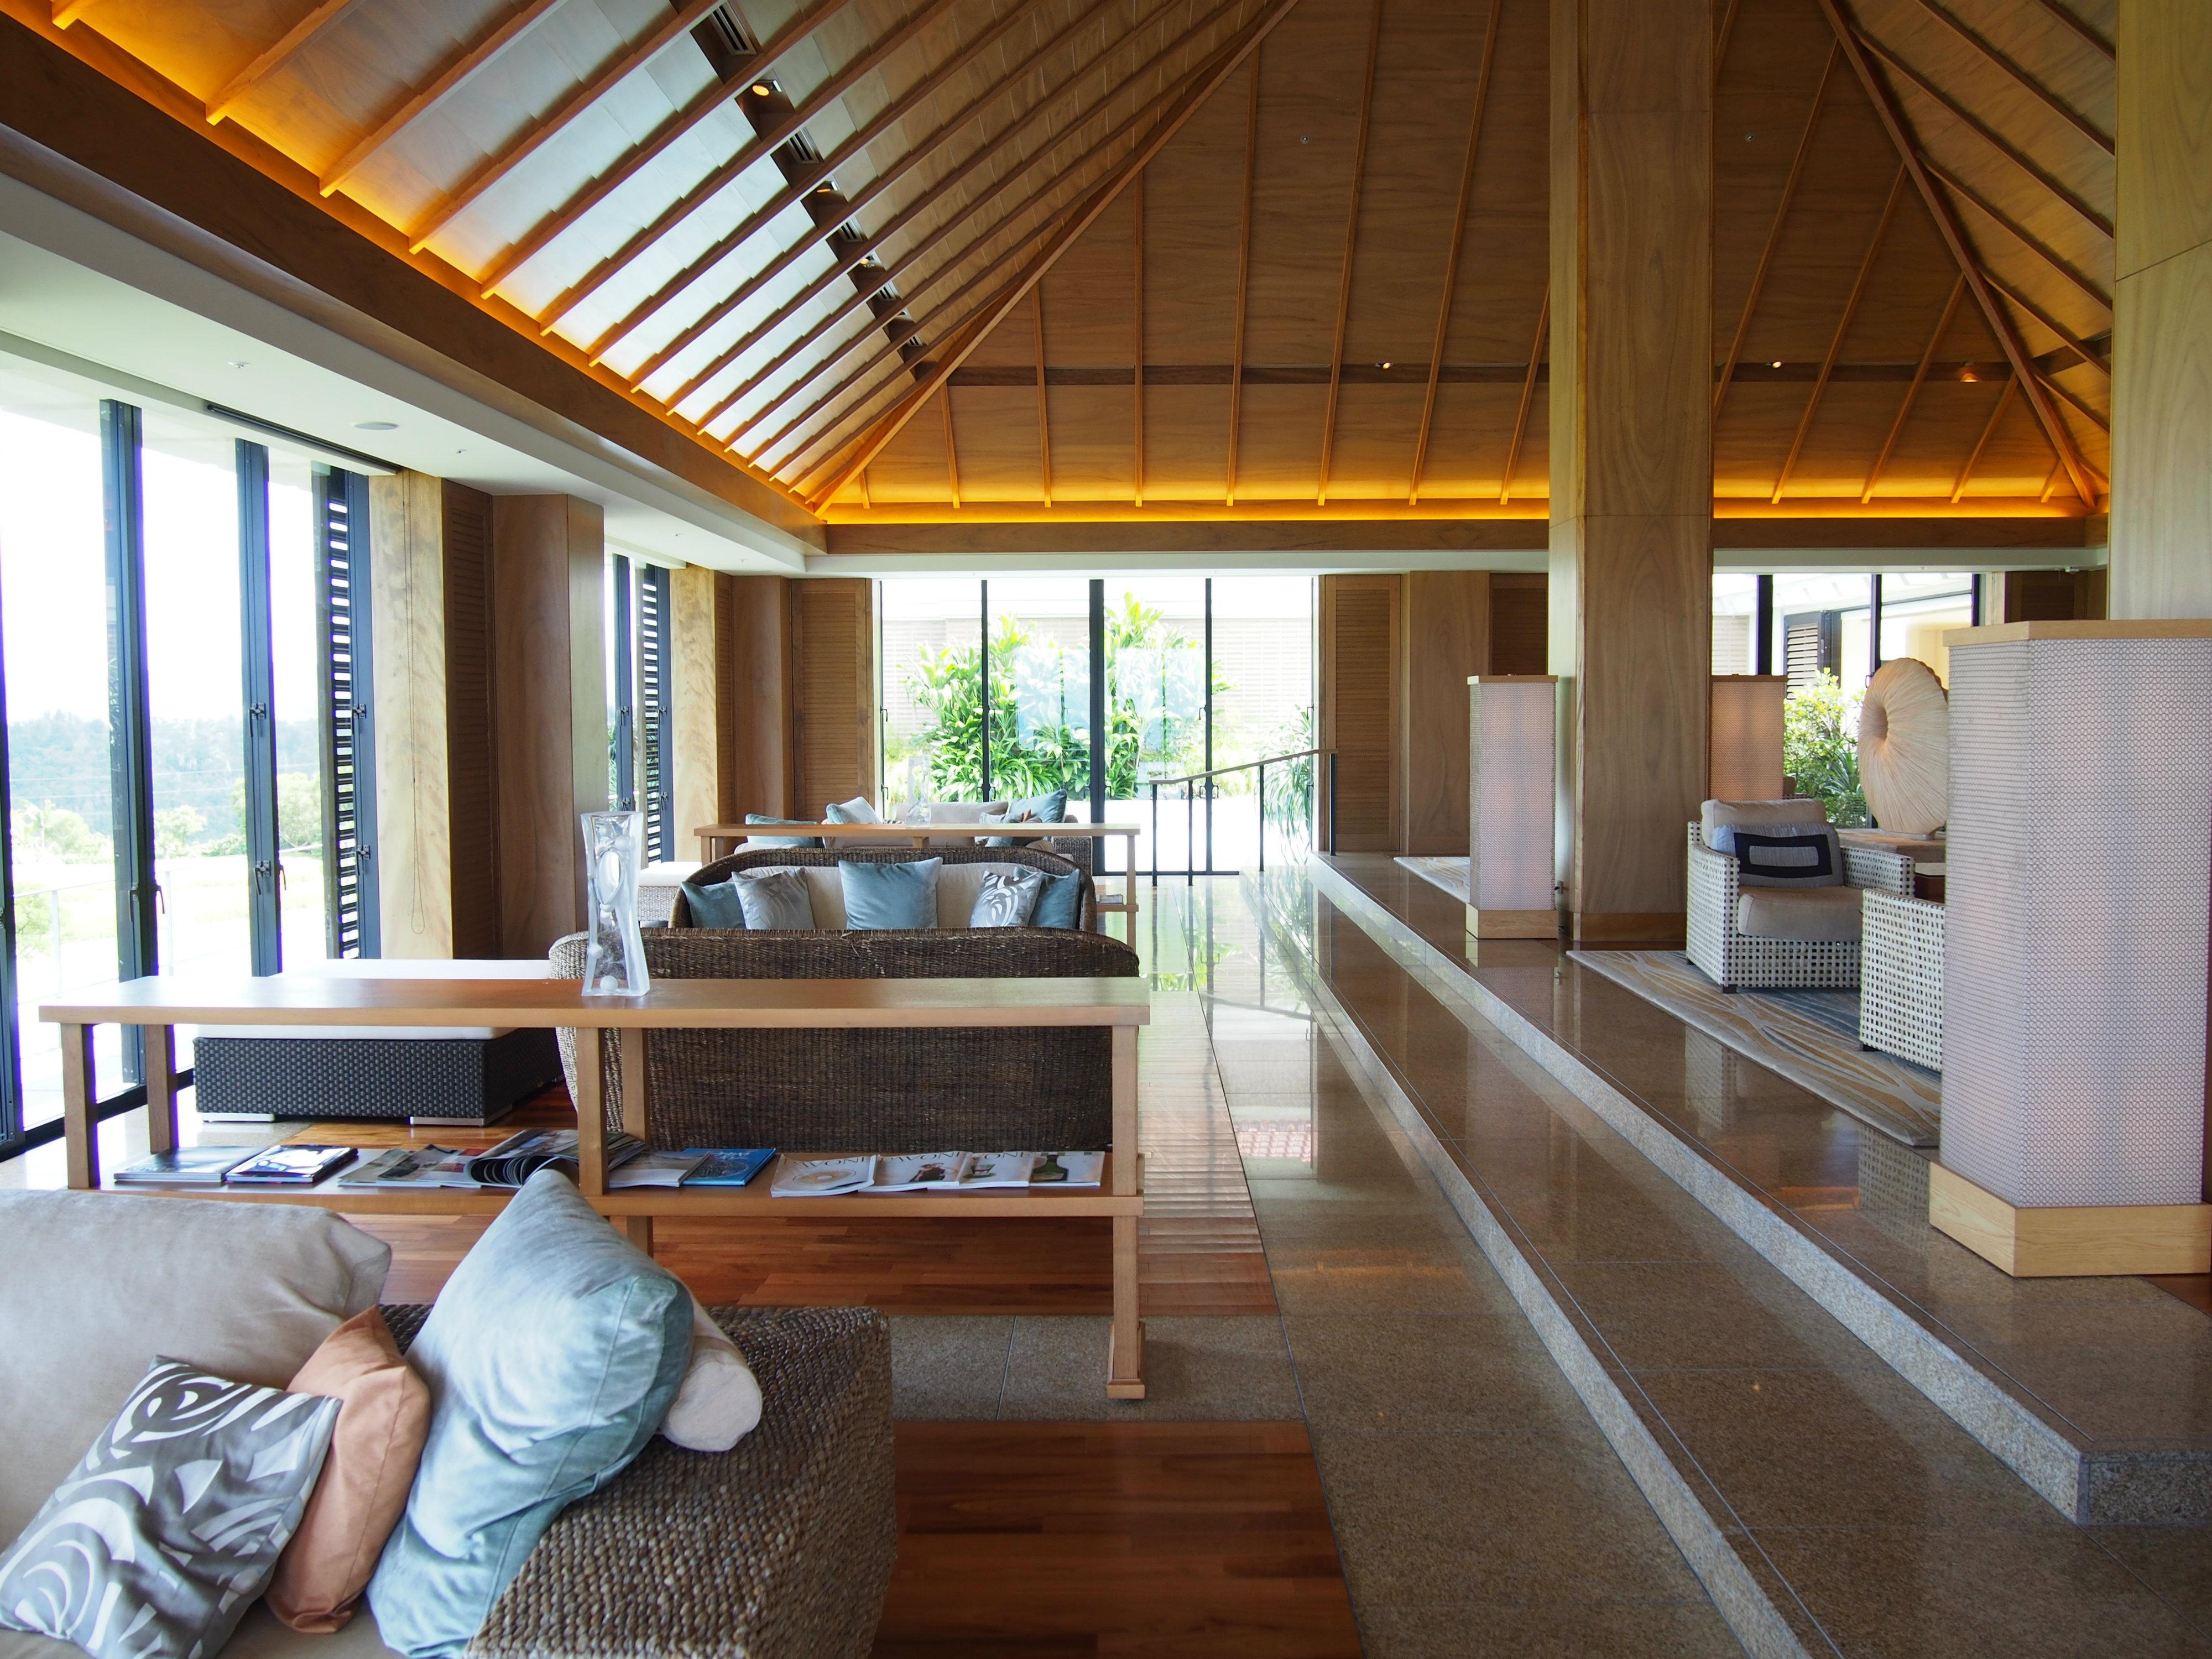 ritz-carlton okinawa lounge